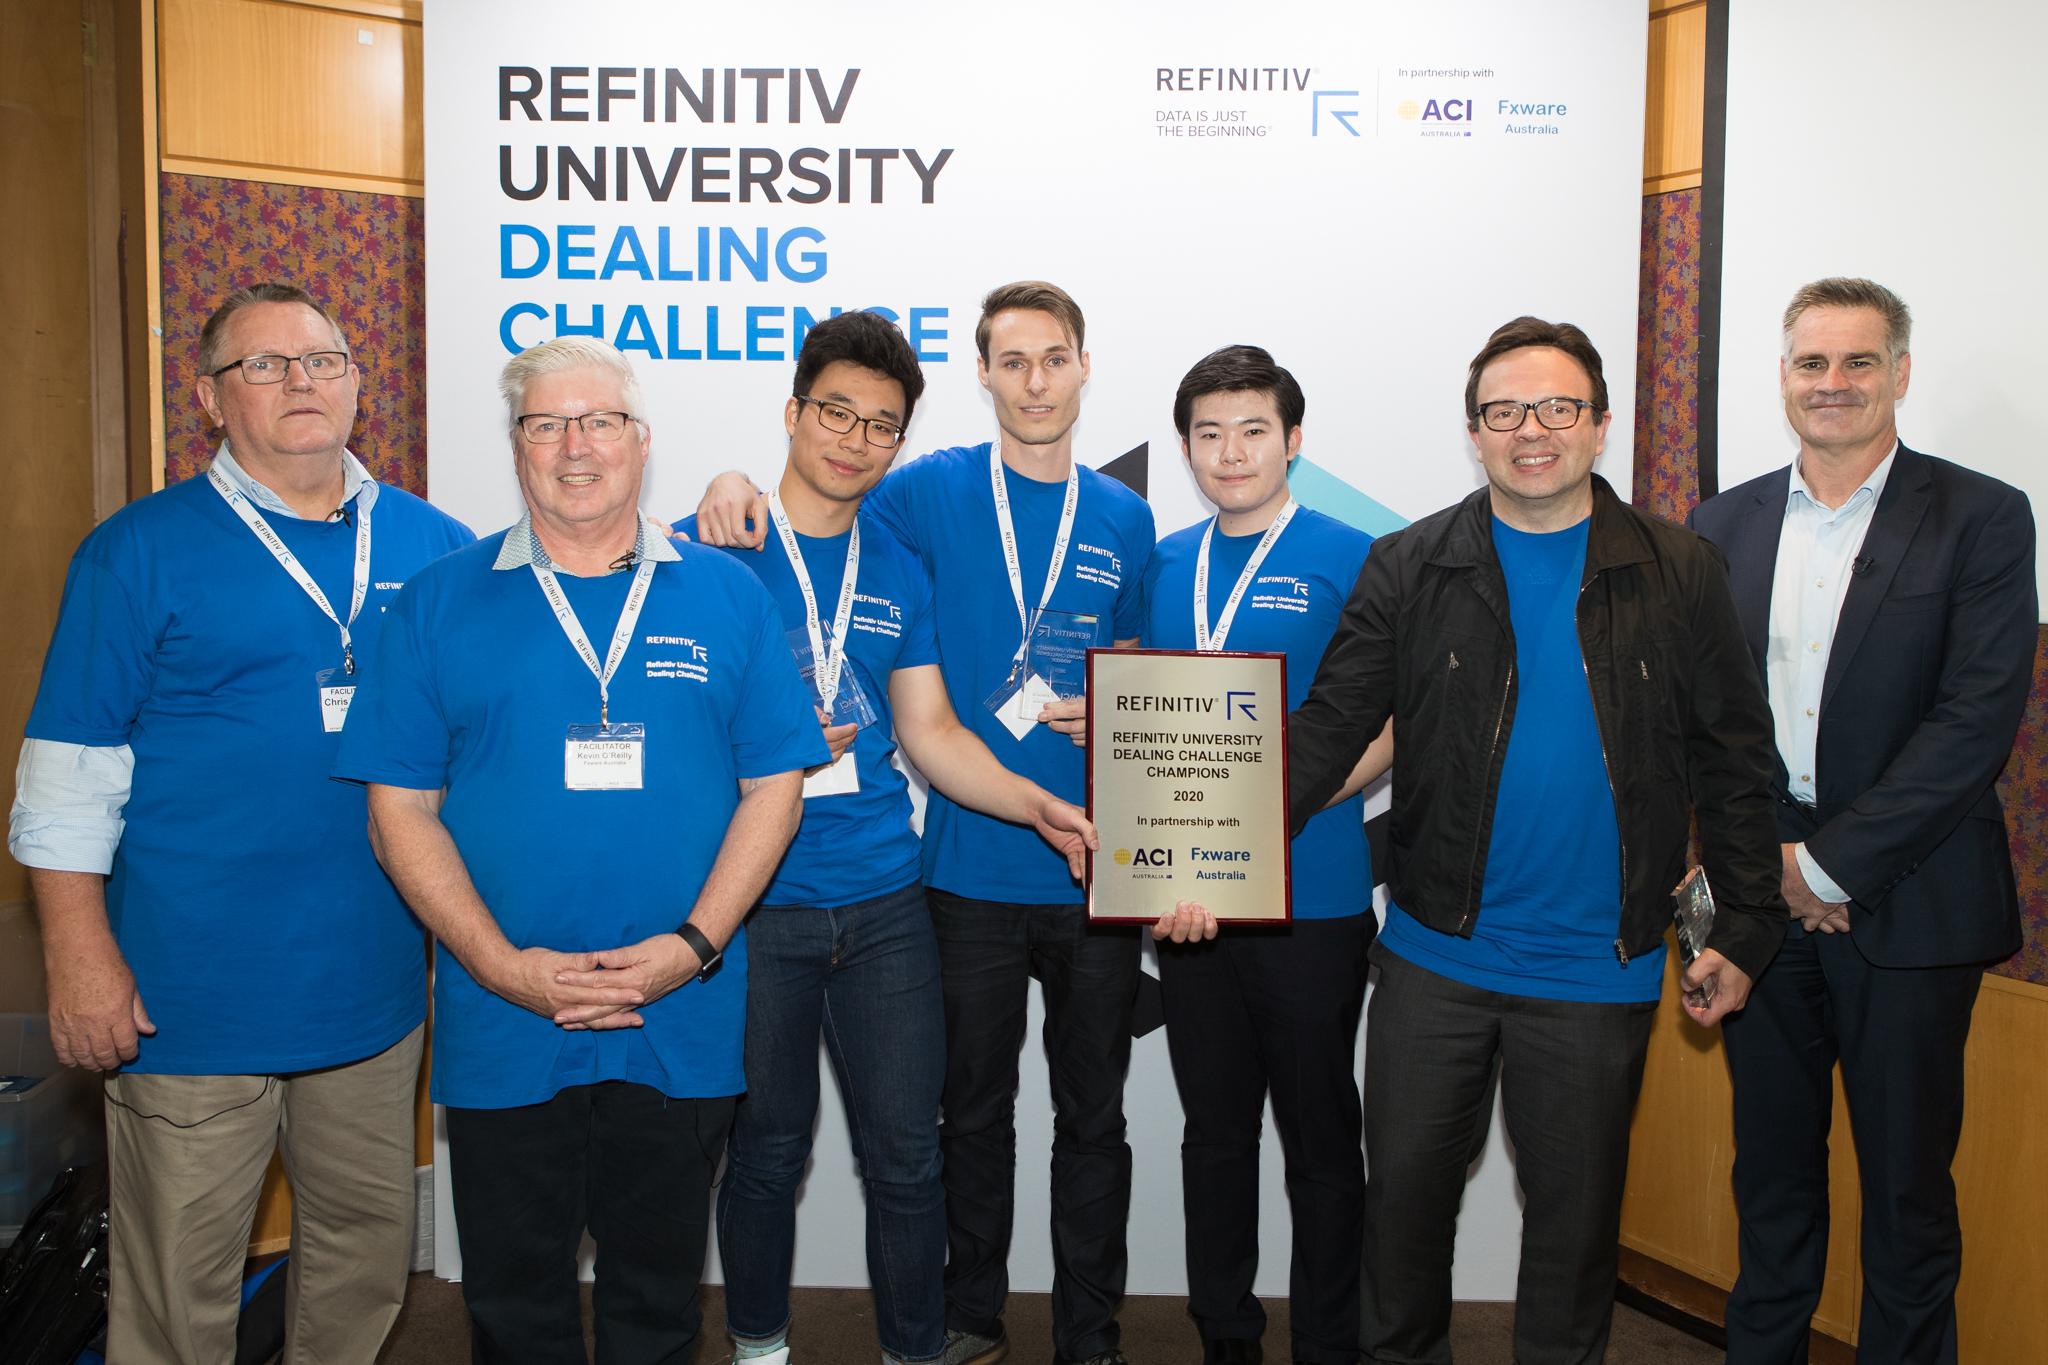 Photo of the winning team, the University of Sydney, at the Refinitiv University Dealing Challenge